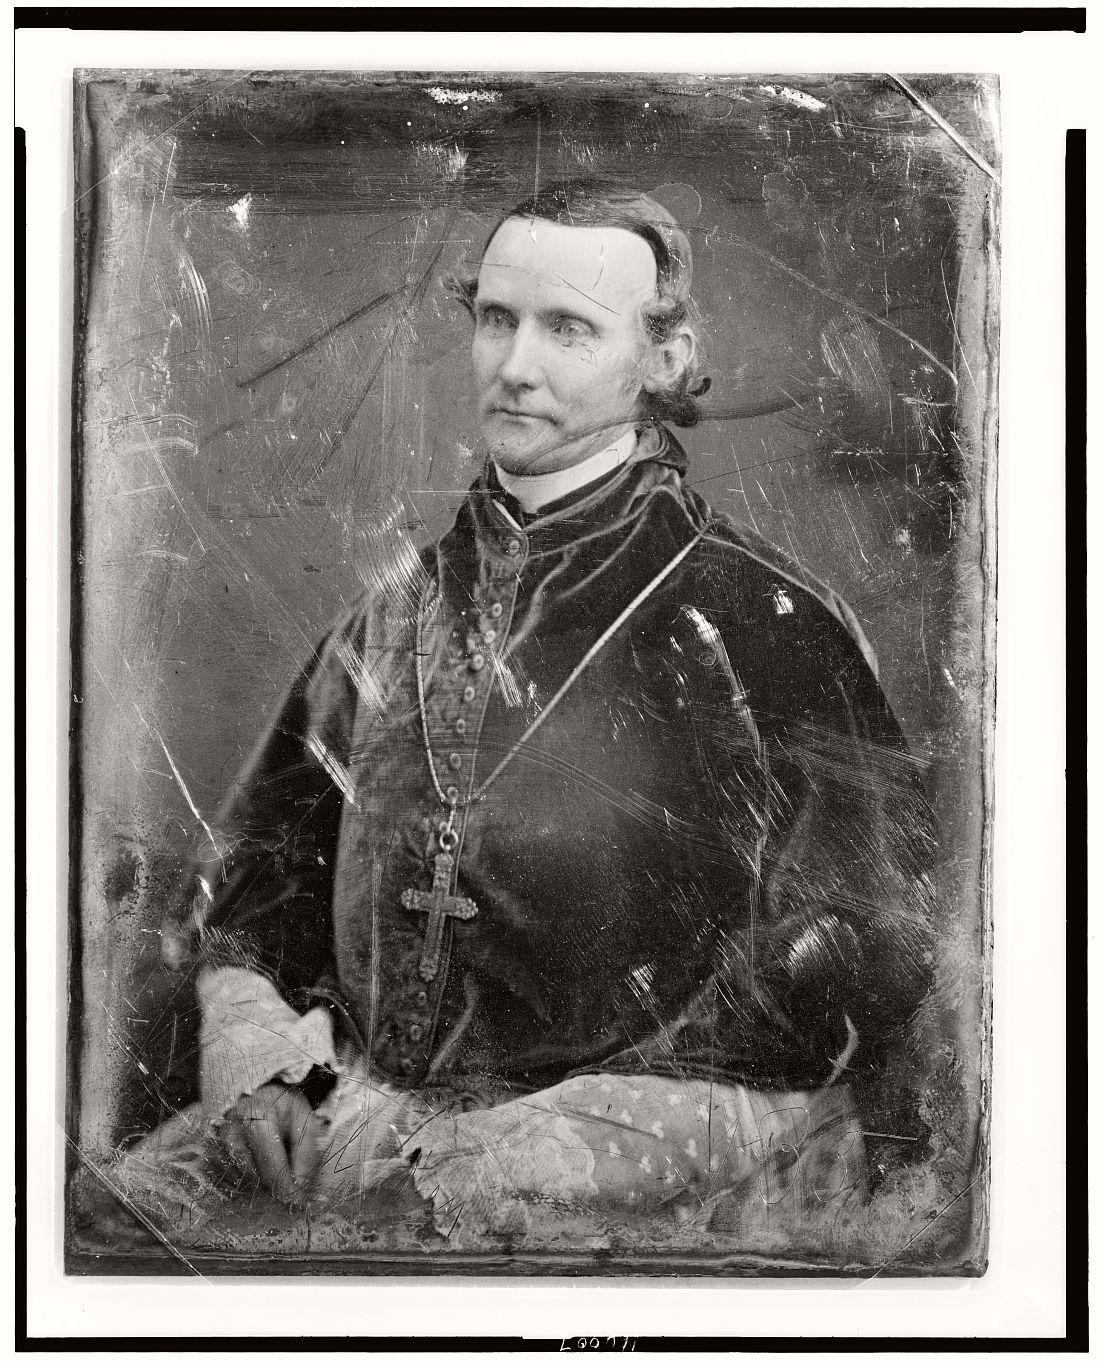 vintage-daguerreotype-portraits-from-xix-century-1844-1860-44